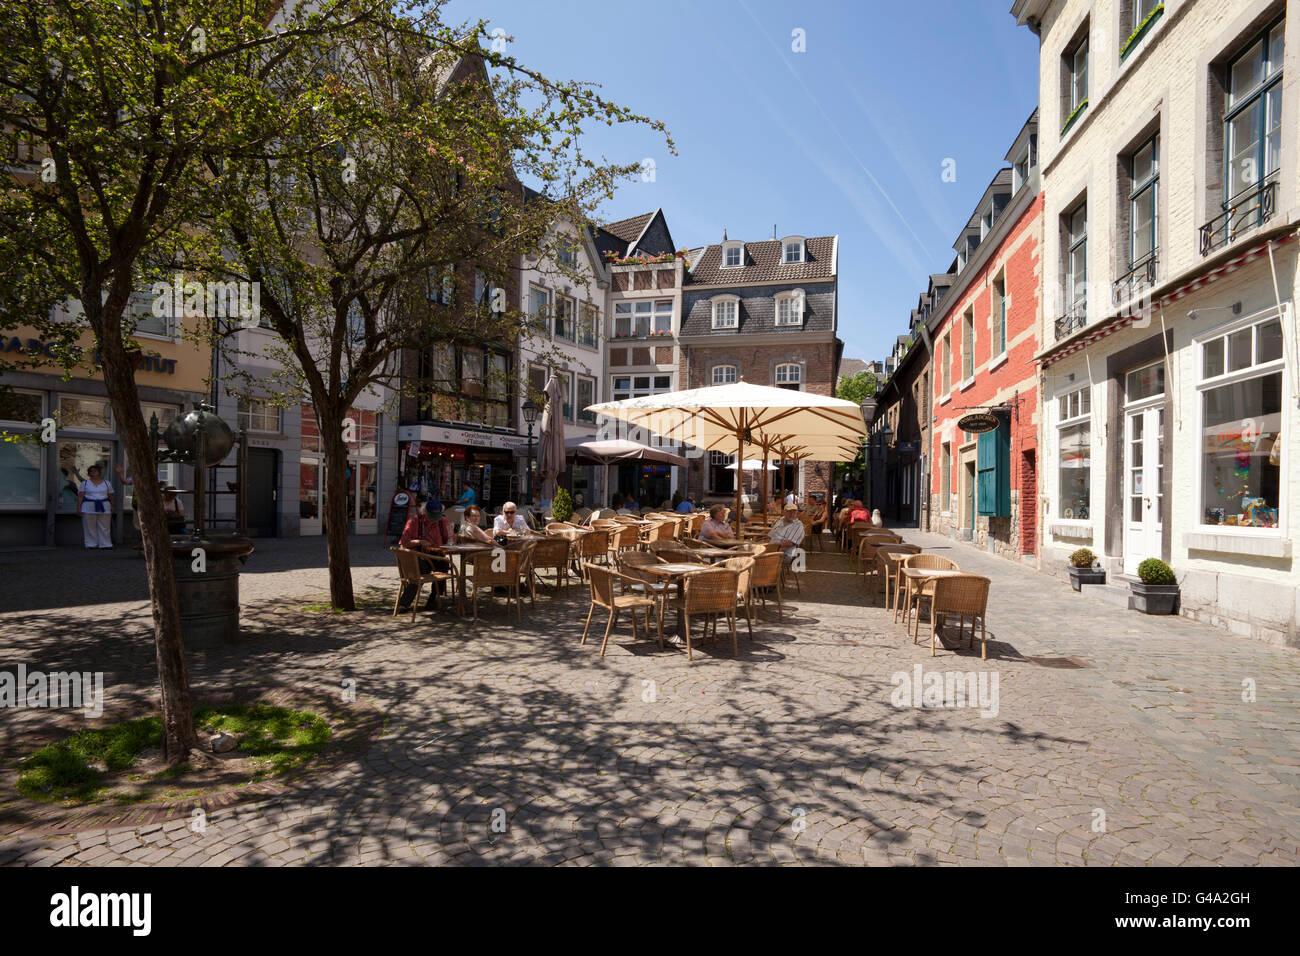 shops and outdoor cafes stockfotos shops and outdoor cafes bilder seite 6 alamy. Black Bedroom Furniture Sets. Home Design Ideas